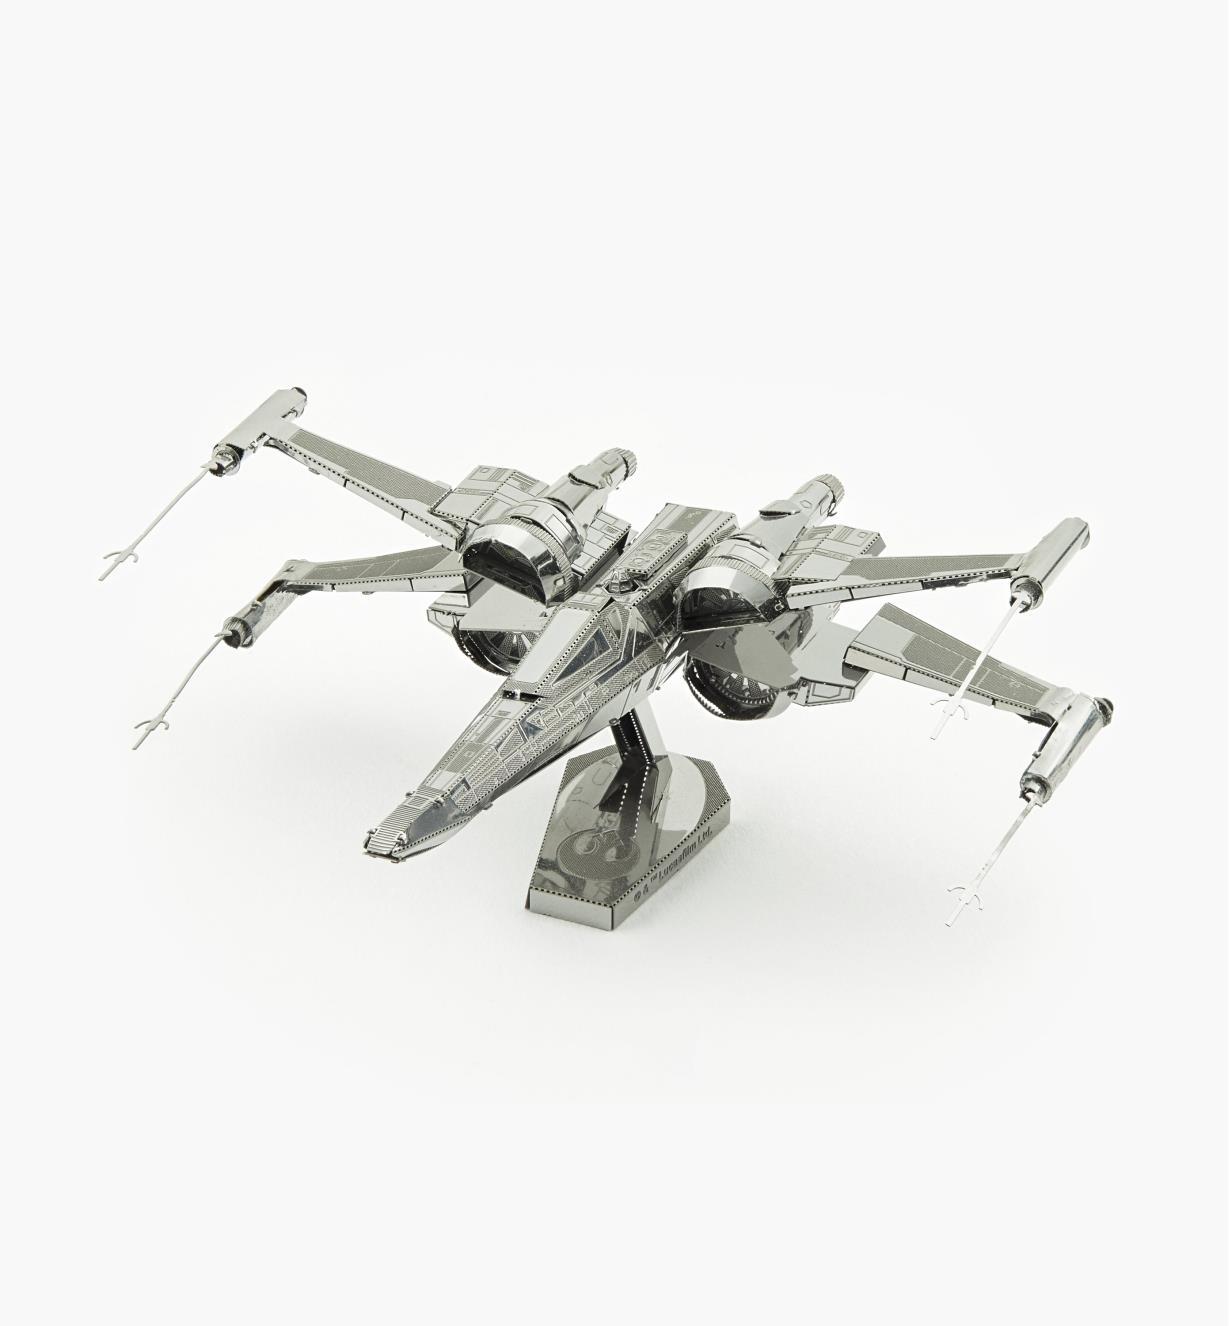 45K4123 - Star Wars: The Force Awakens Metal Model Kit -Poe Dameron's X-Wing